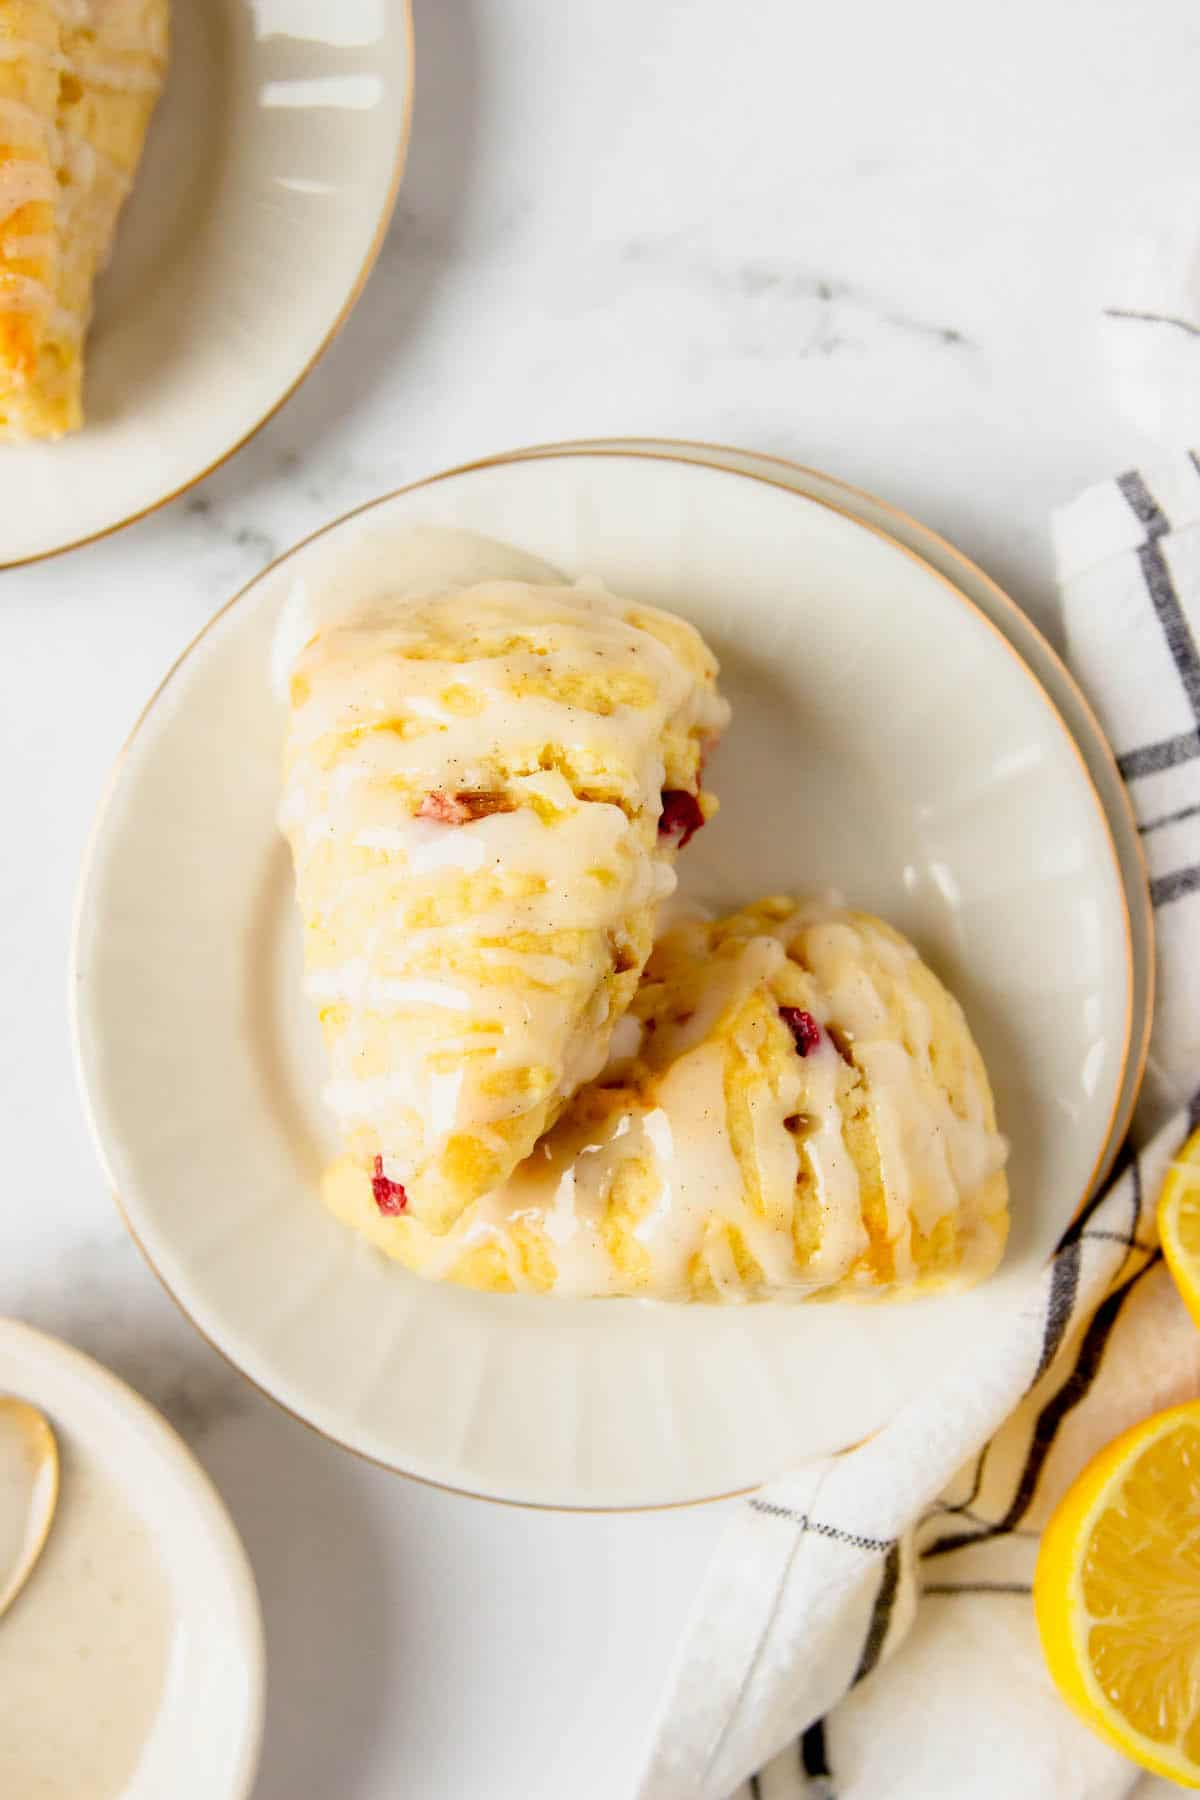 Two lemon rhubarb scones on a plate